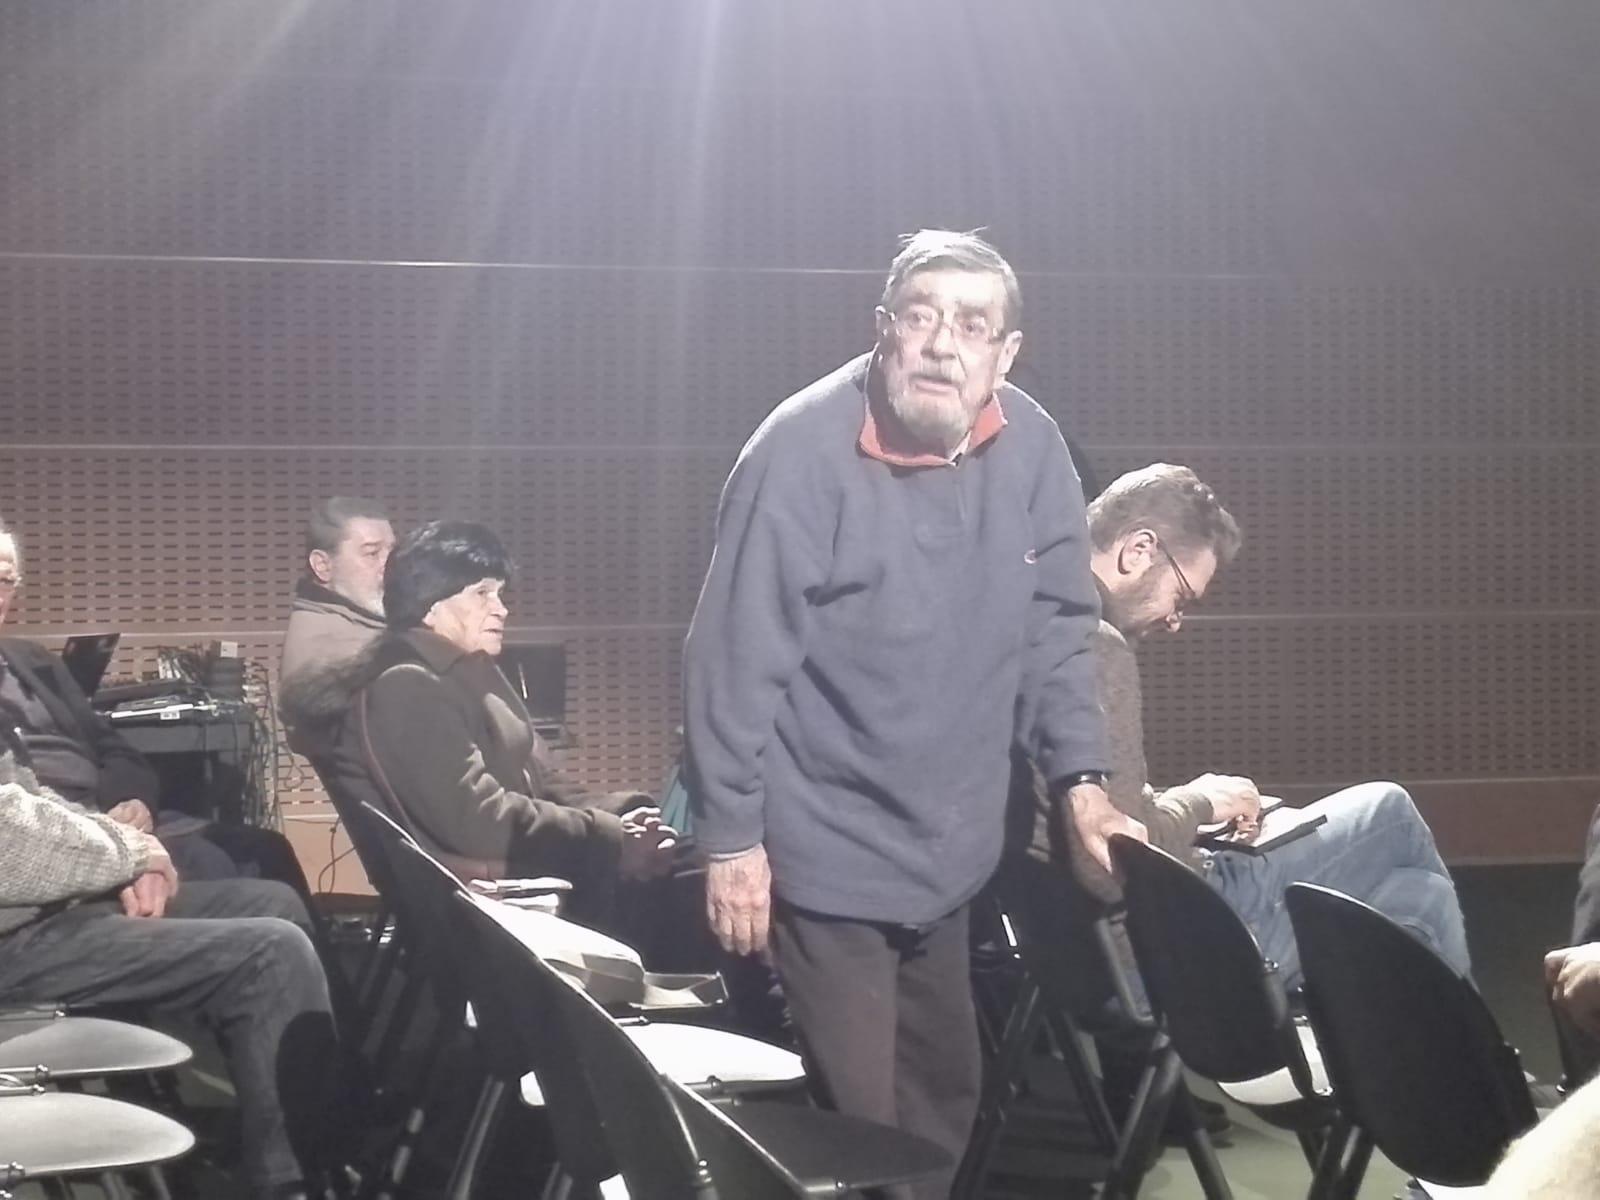 arh Emanoil Mihailescu